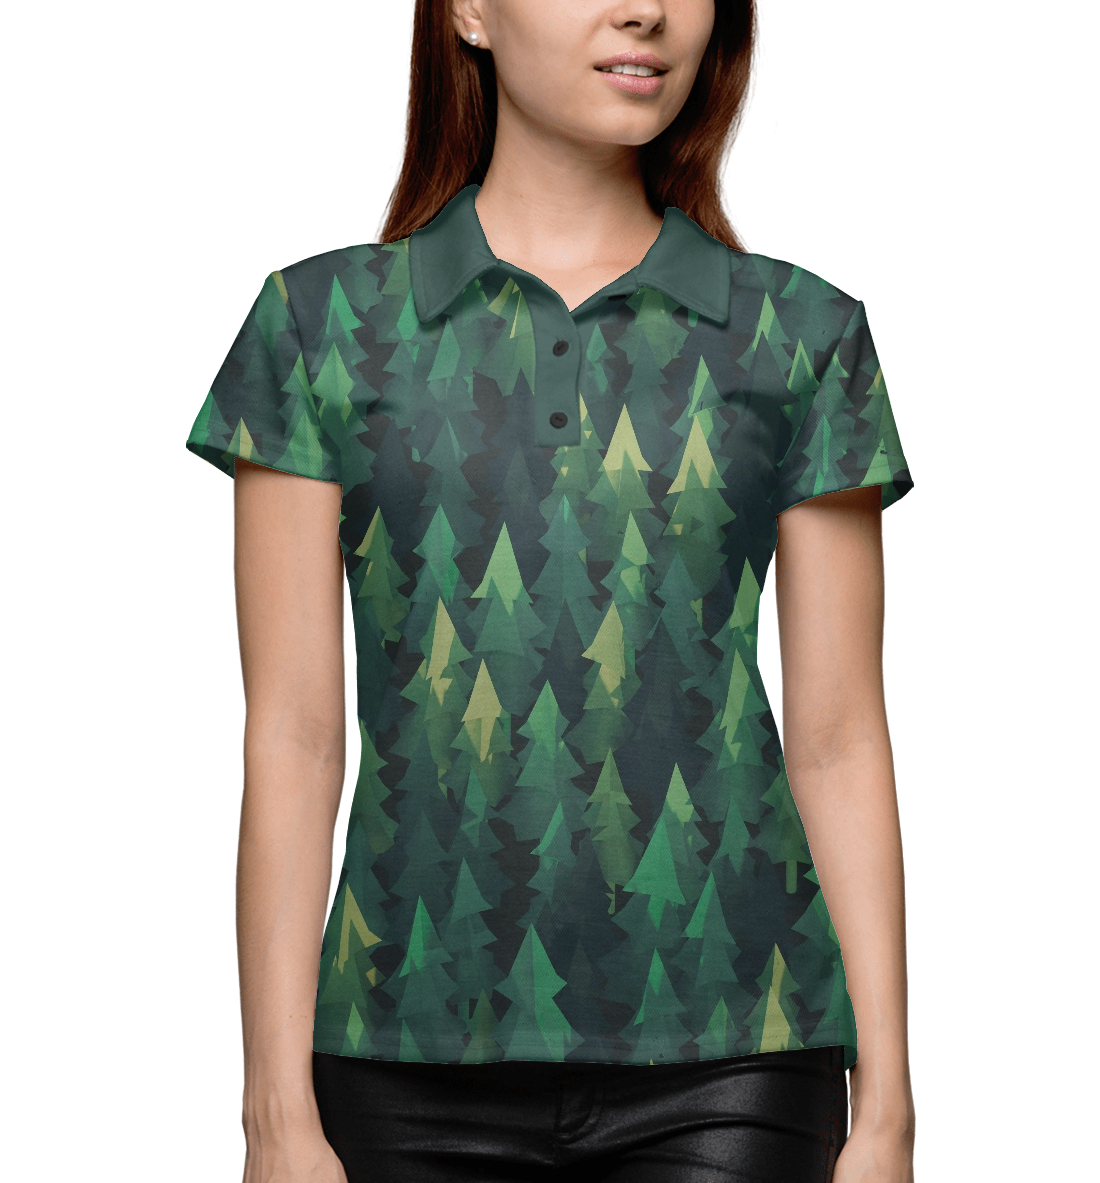 Купить Simple forest, Printbar, Поло, APD-523867-pol-1